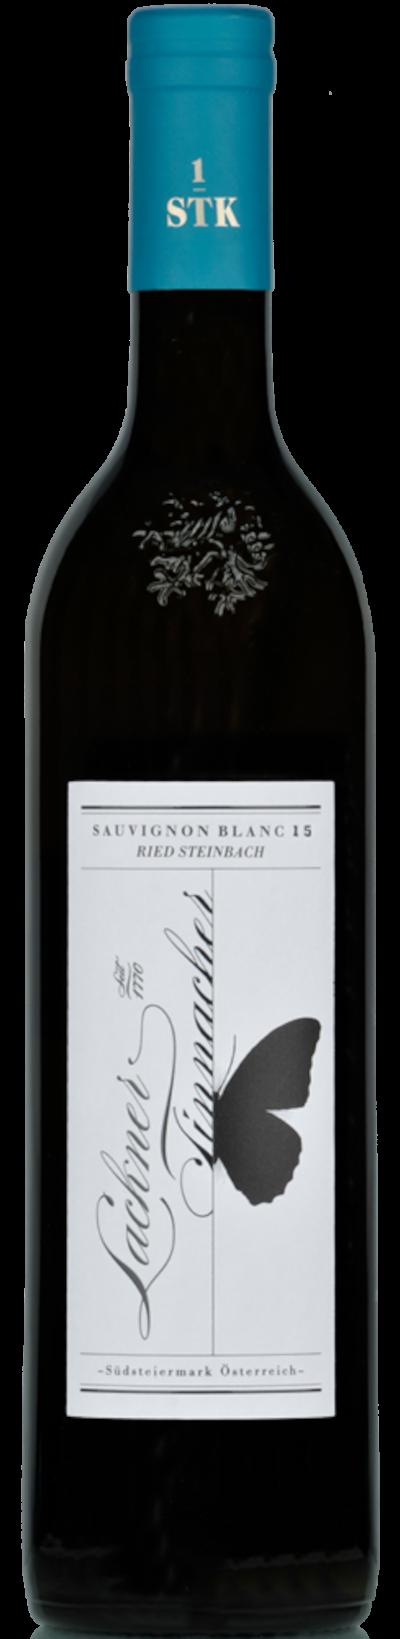 LacknerTinnacher - Sauvignon Blanc Ried Steinbach bio